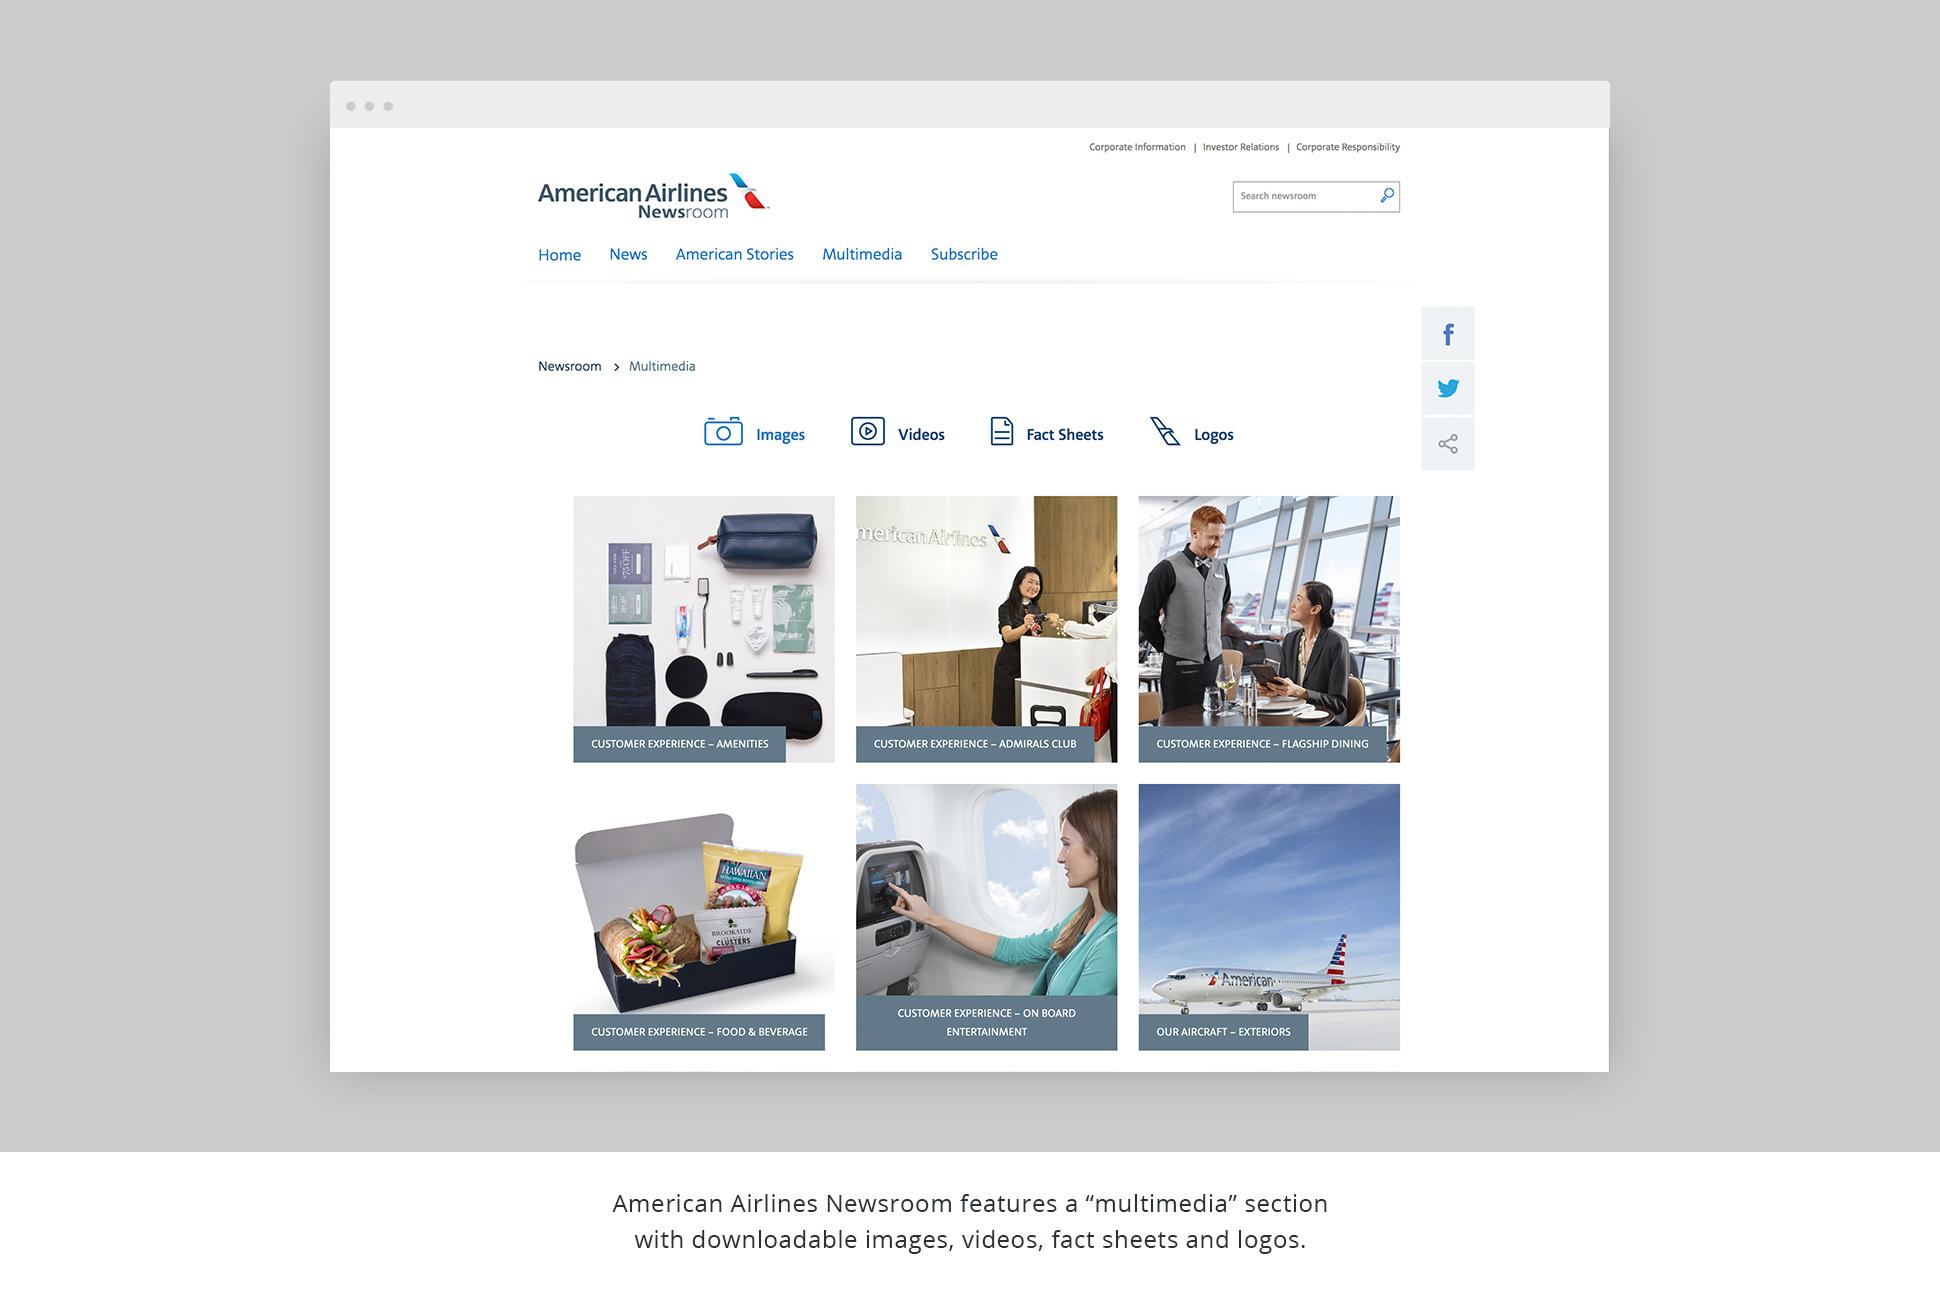 inset_image_american_airlines.jpg